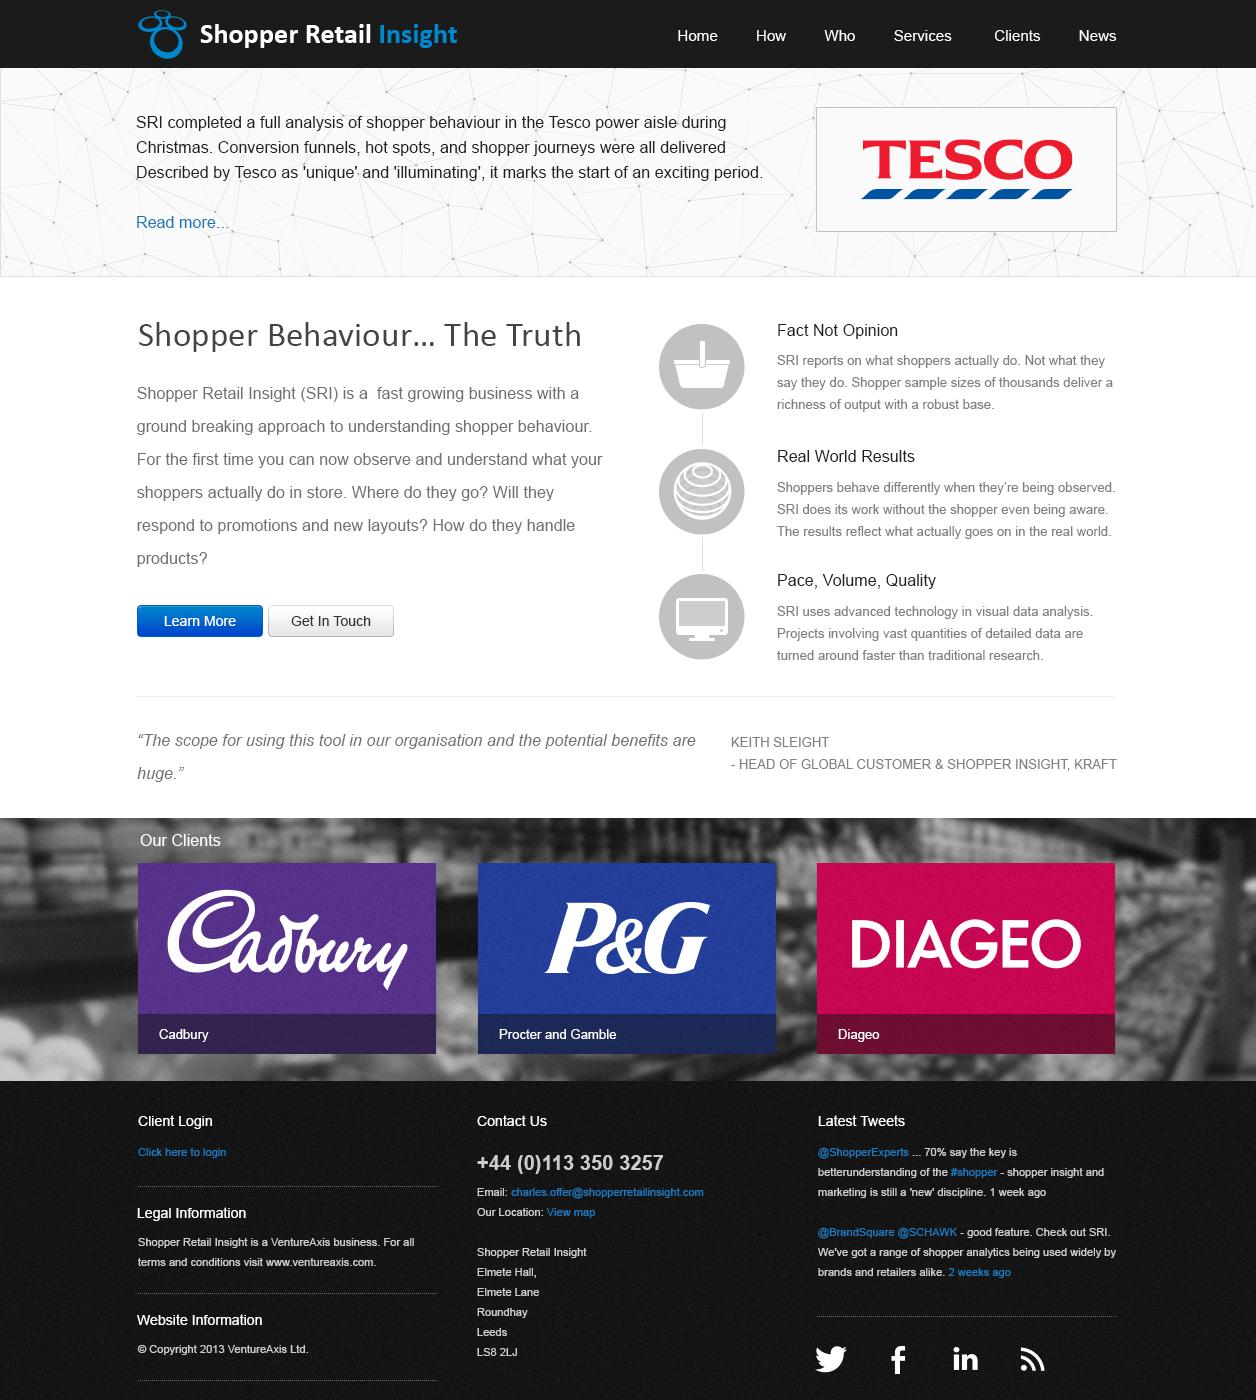 Sri homepage